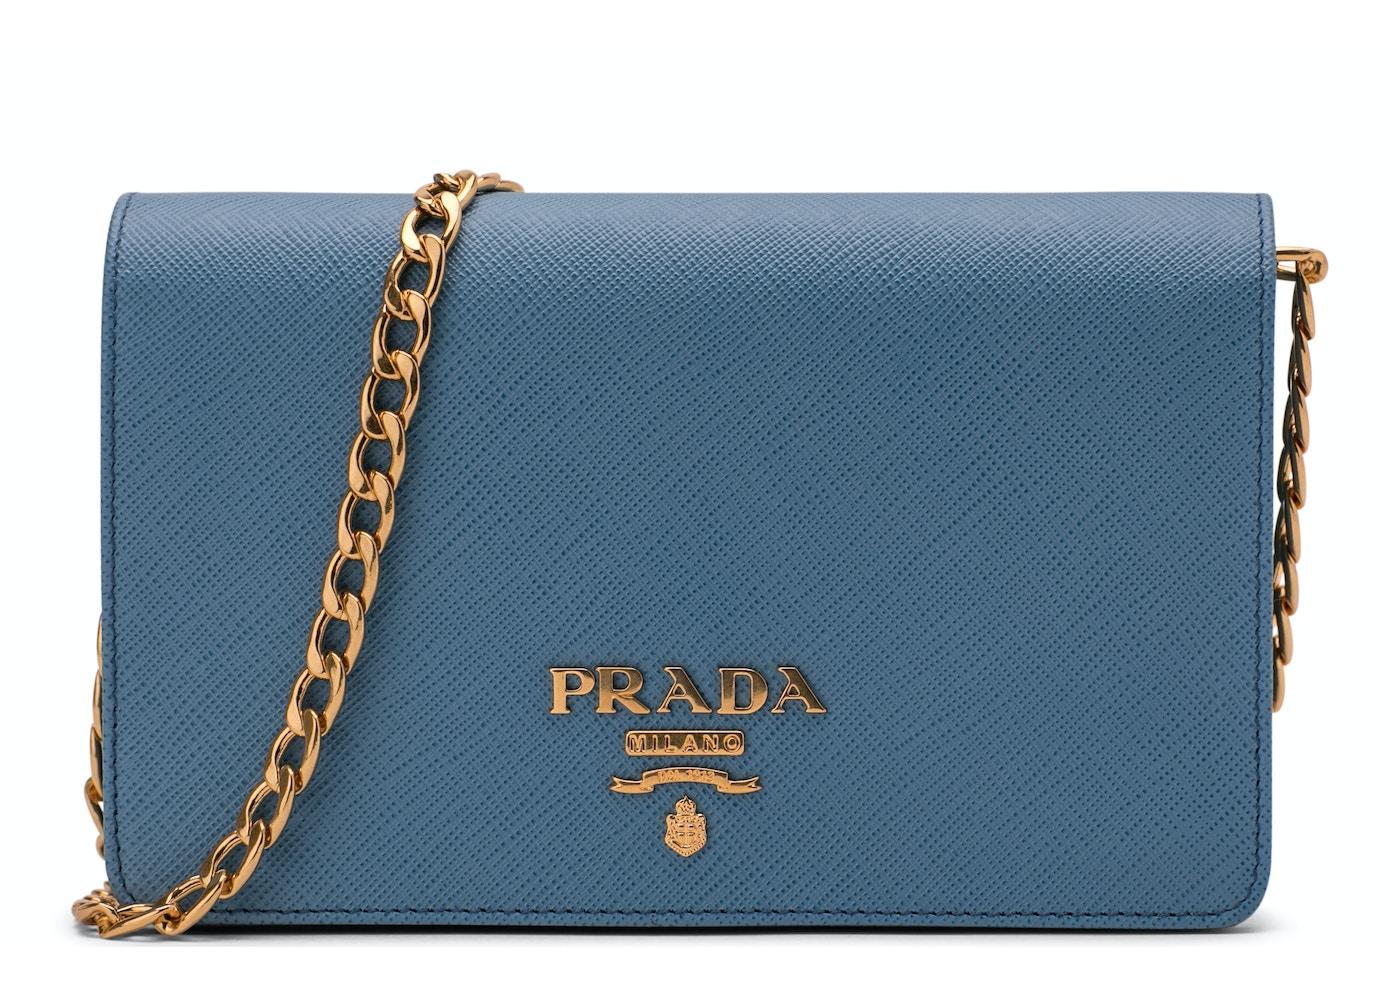 85ea966b114bfd Prada Crossbody With Chain Saffiano Leather Baby Blue. Saffiano Leather  Baby Blue